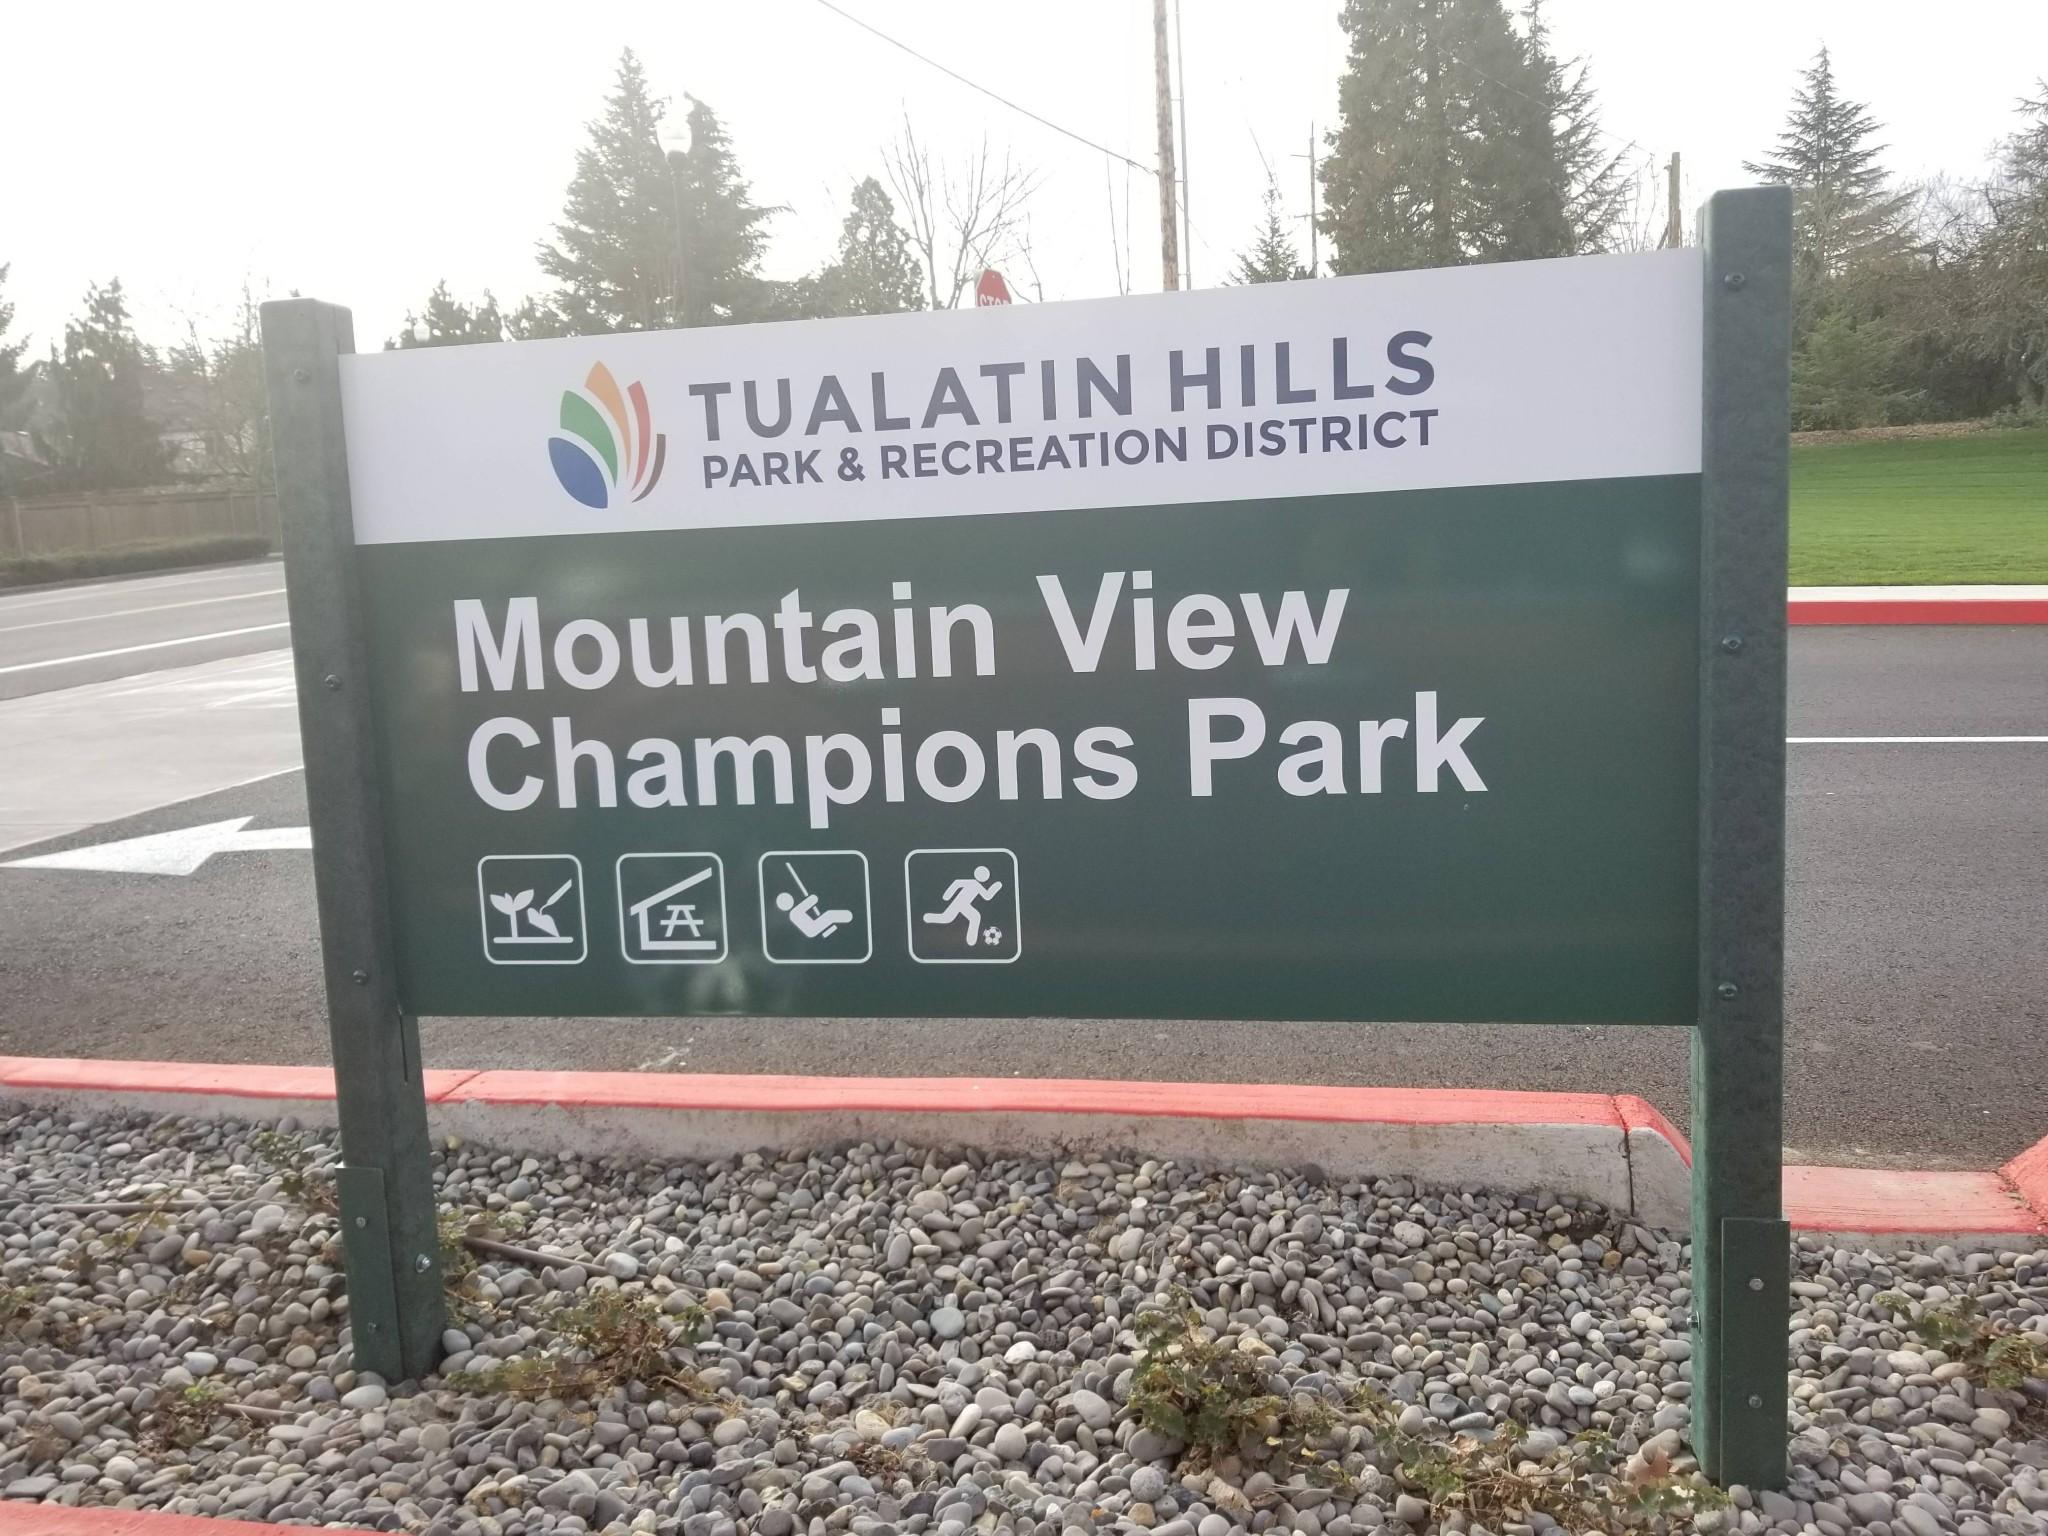 Mountain View Champions Park Aloha Oregon THPRD